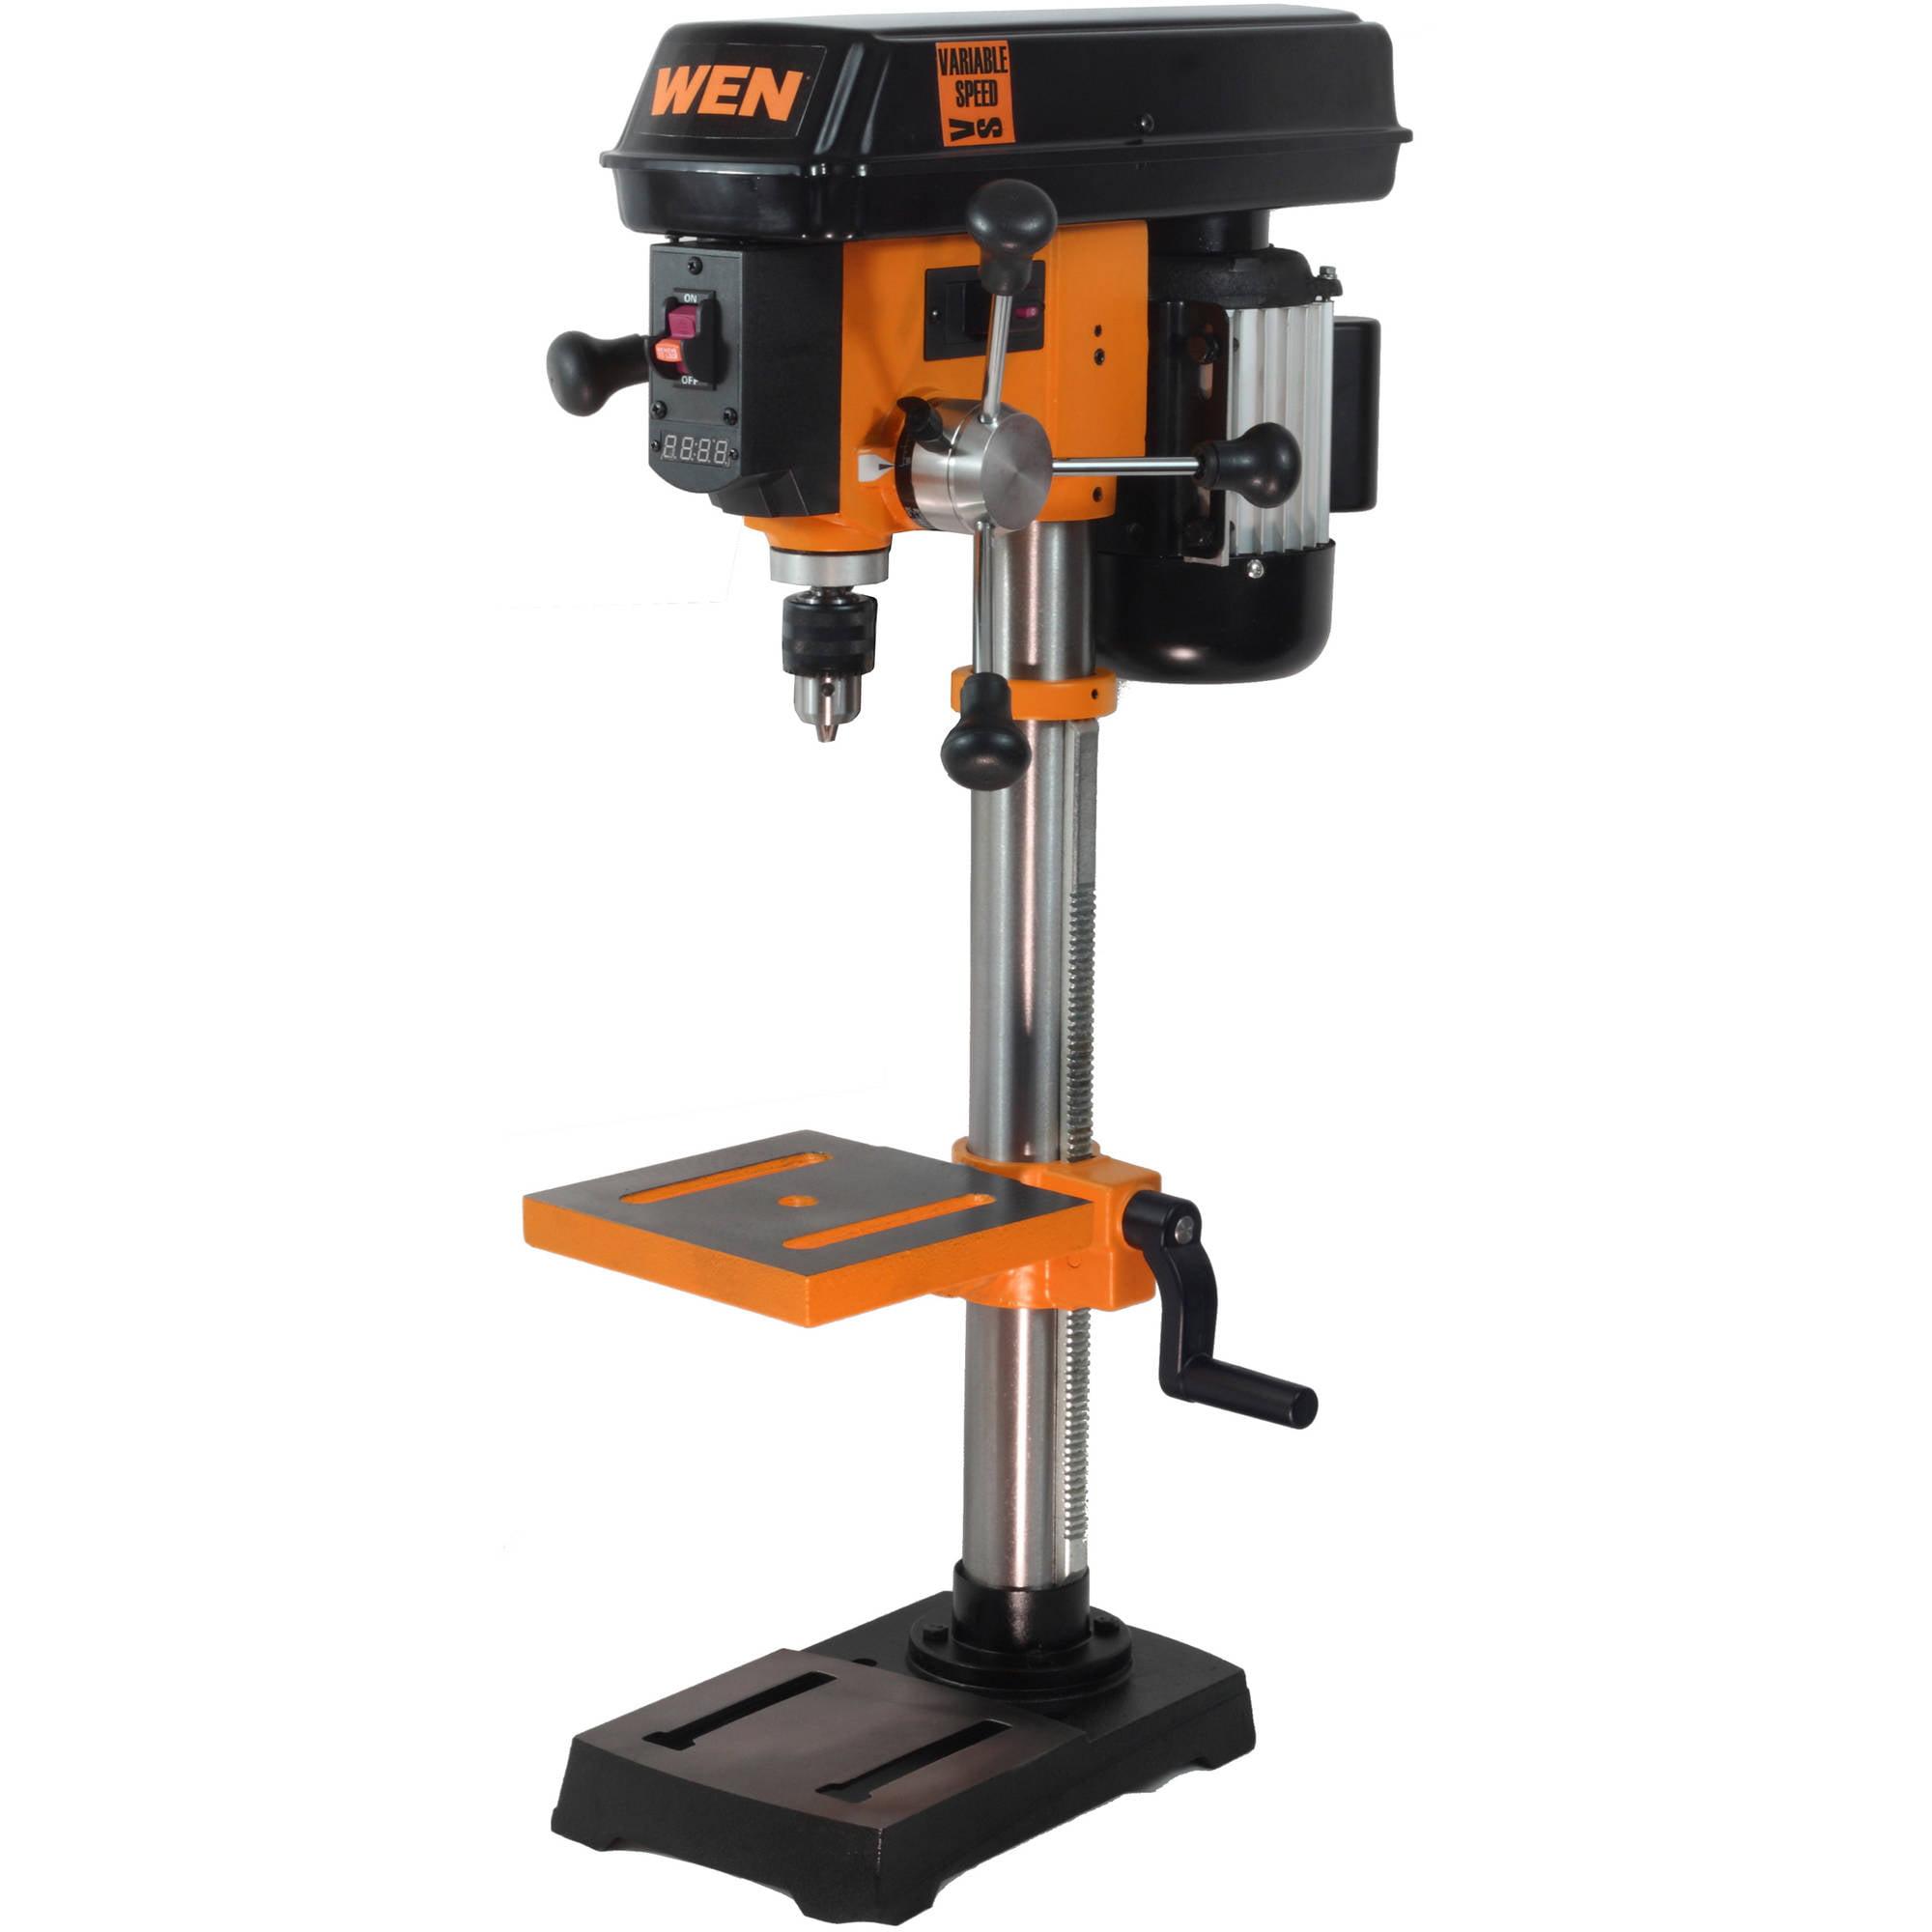 "Wen 10"" Variable Speed Drill Press"